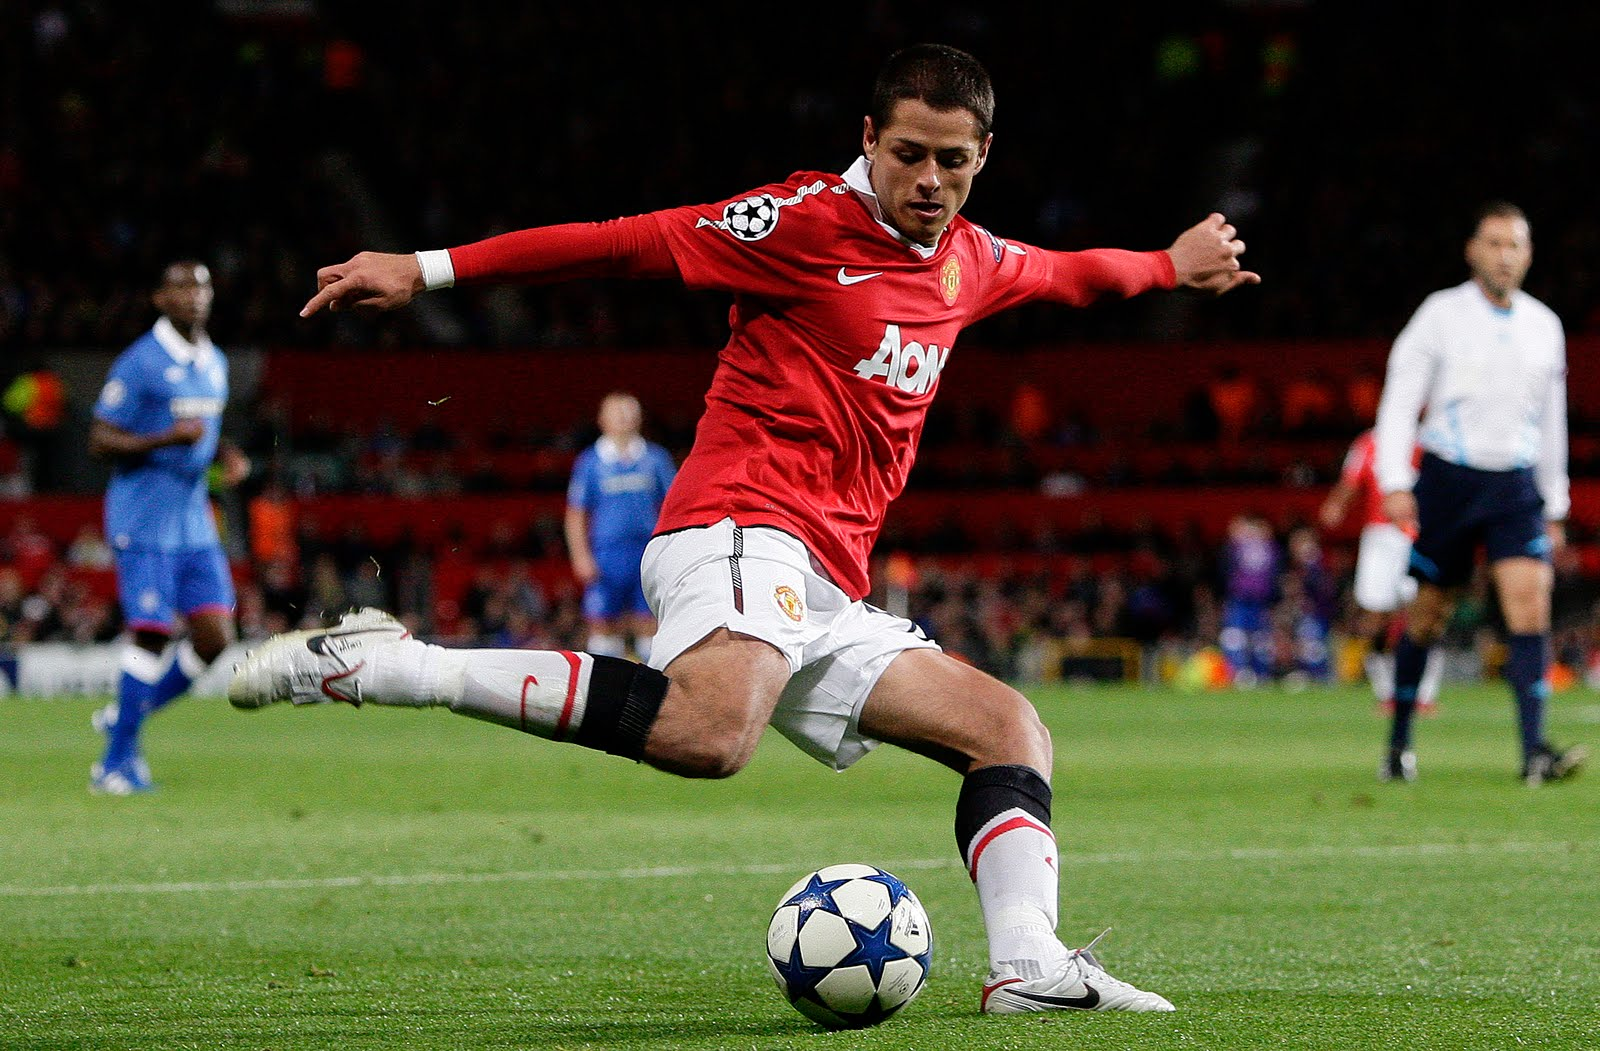 Chicharito (Javier Hernández Balcázar ) - Zone Soccer Player  Chicharito (Jav...